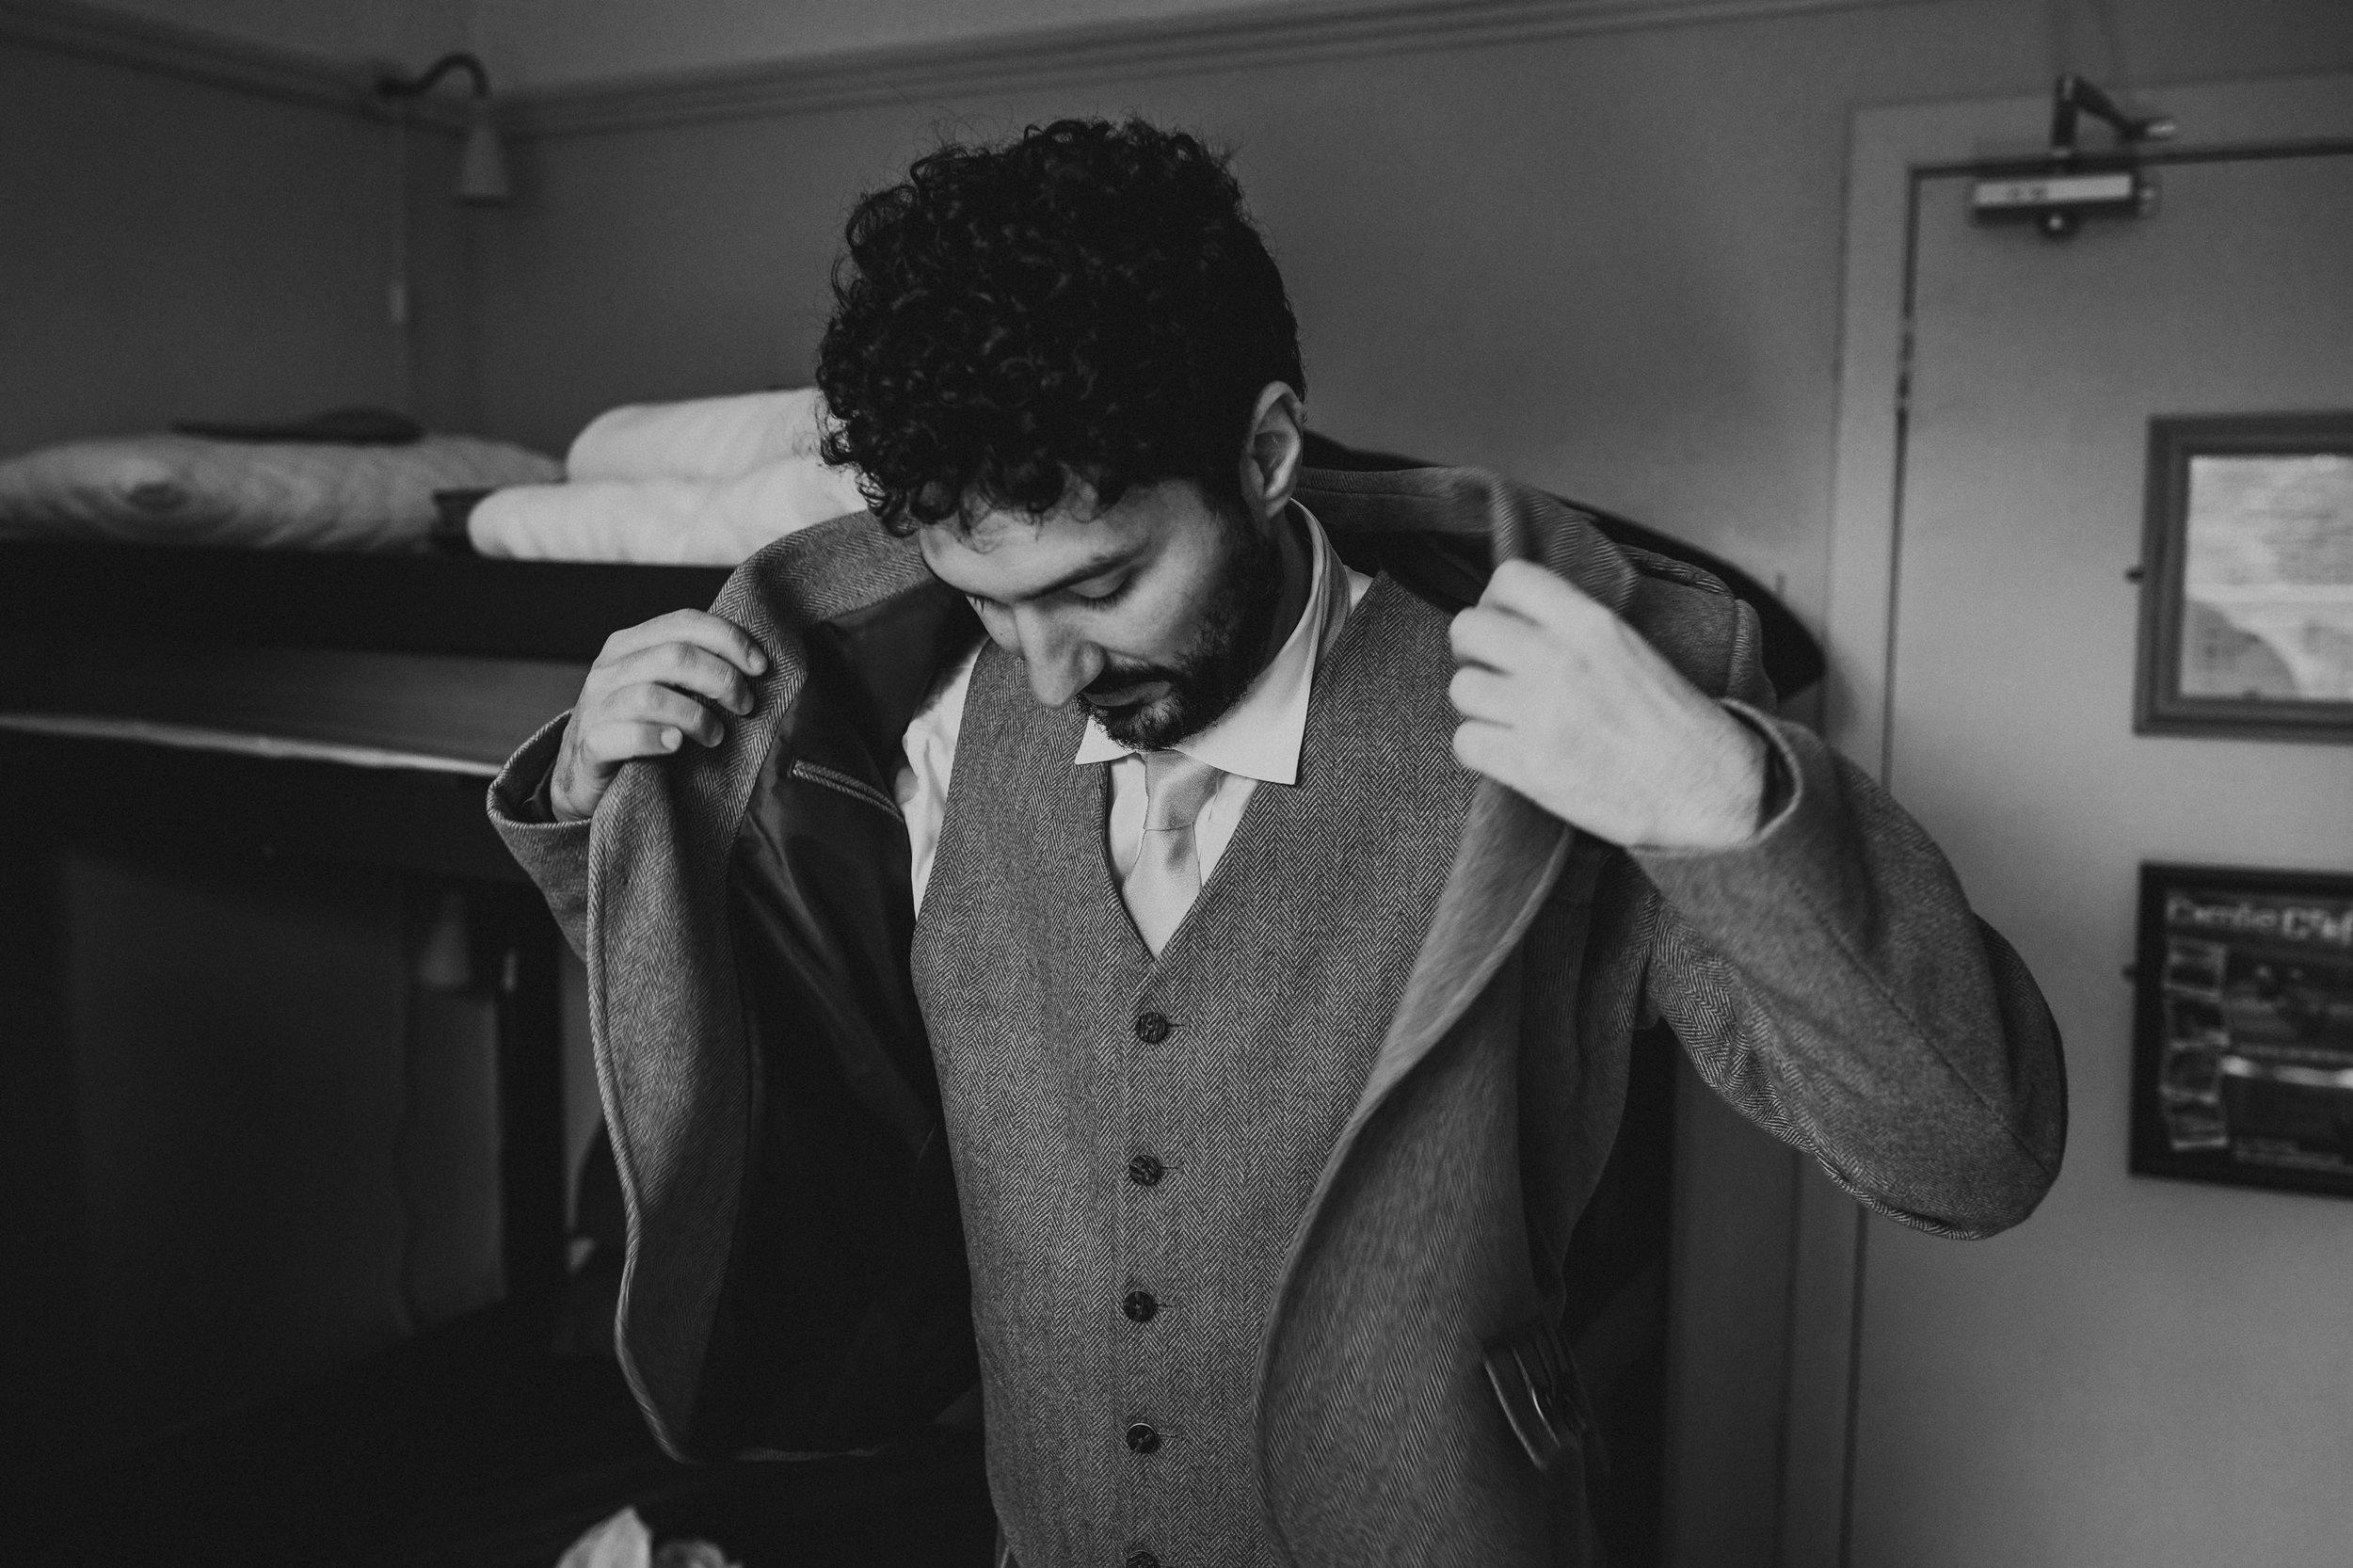 COMRIE_CROFT_WEDDINGS_PJ_PHILLIPS_PHOTOGRAPHY_32.jpg